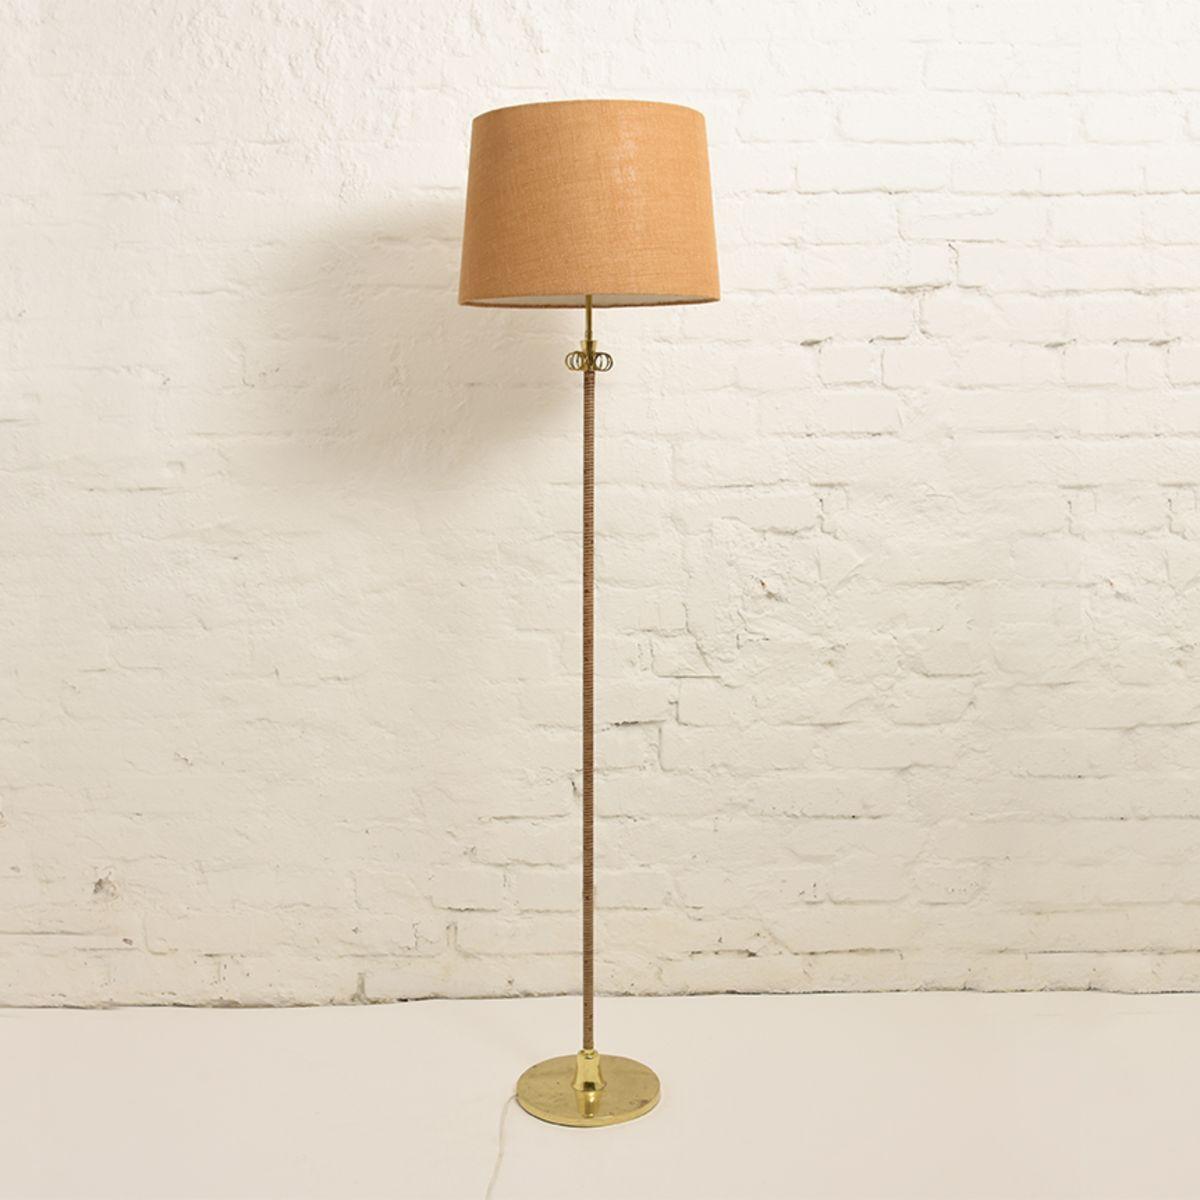 Itsu-Oy-Brass-Rattan-Floor-Lamp